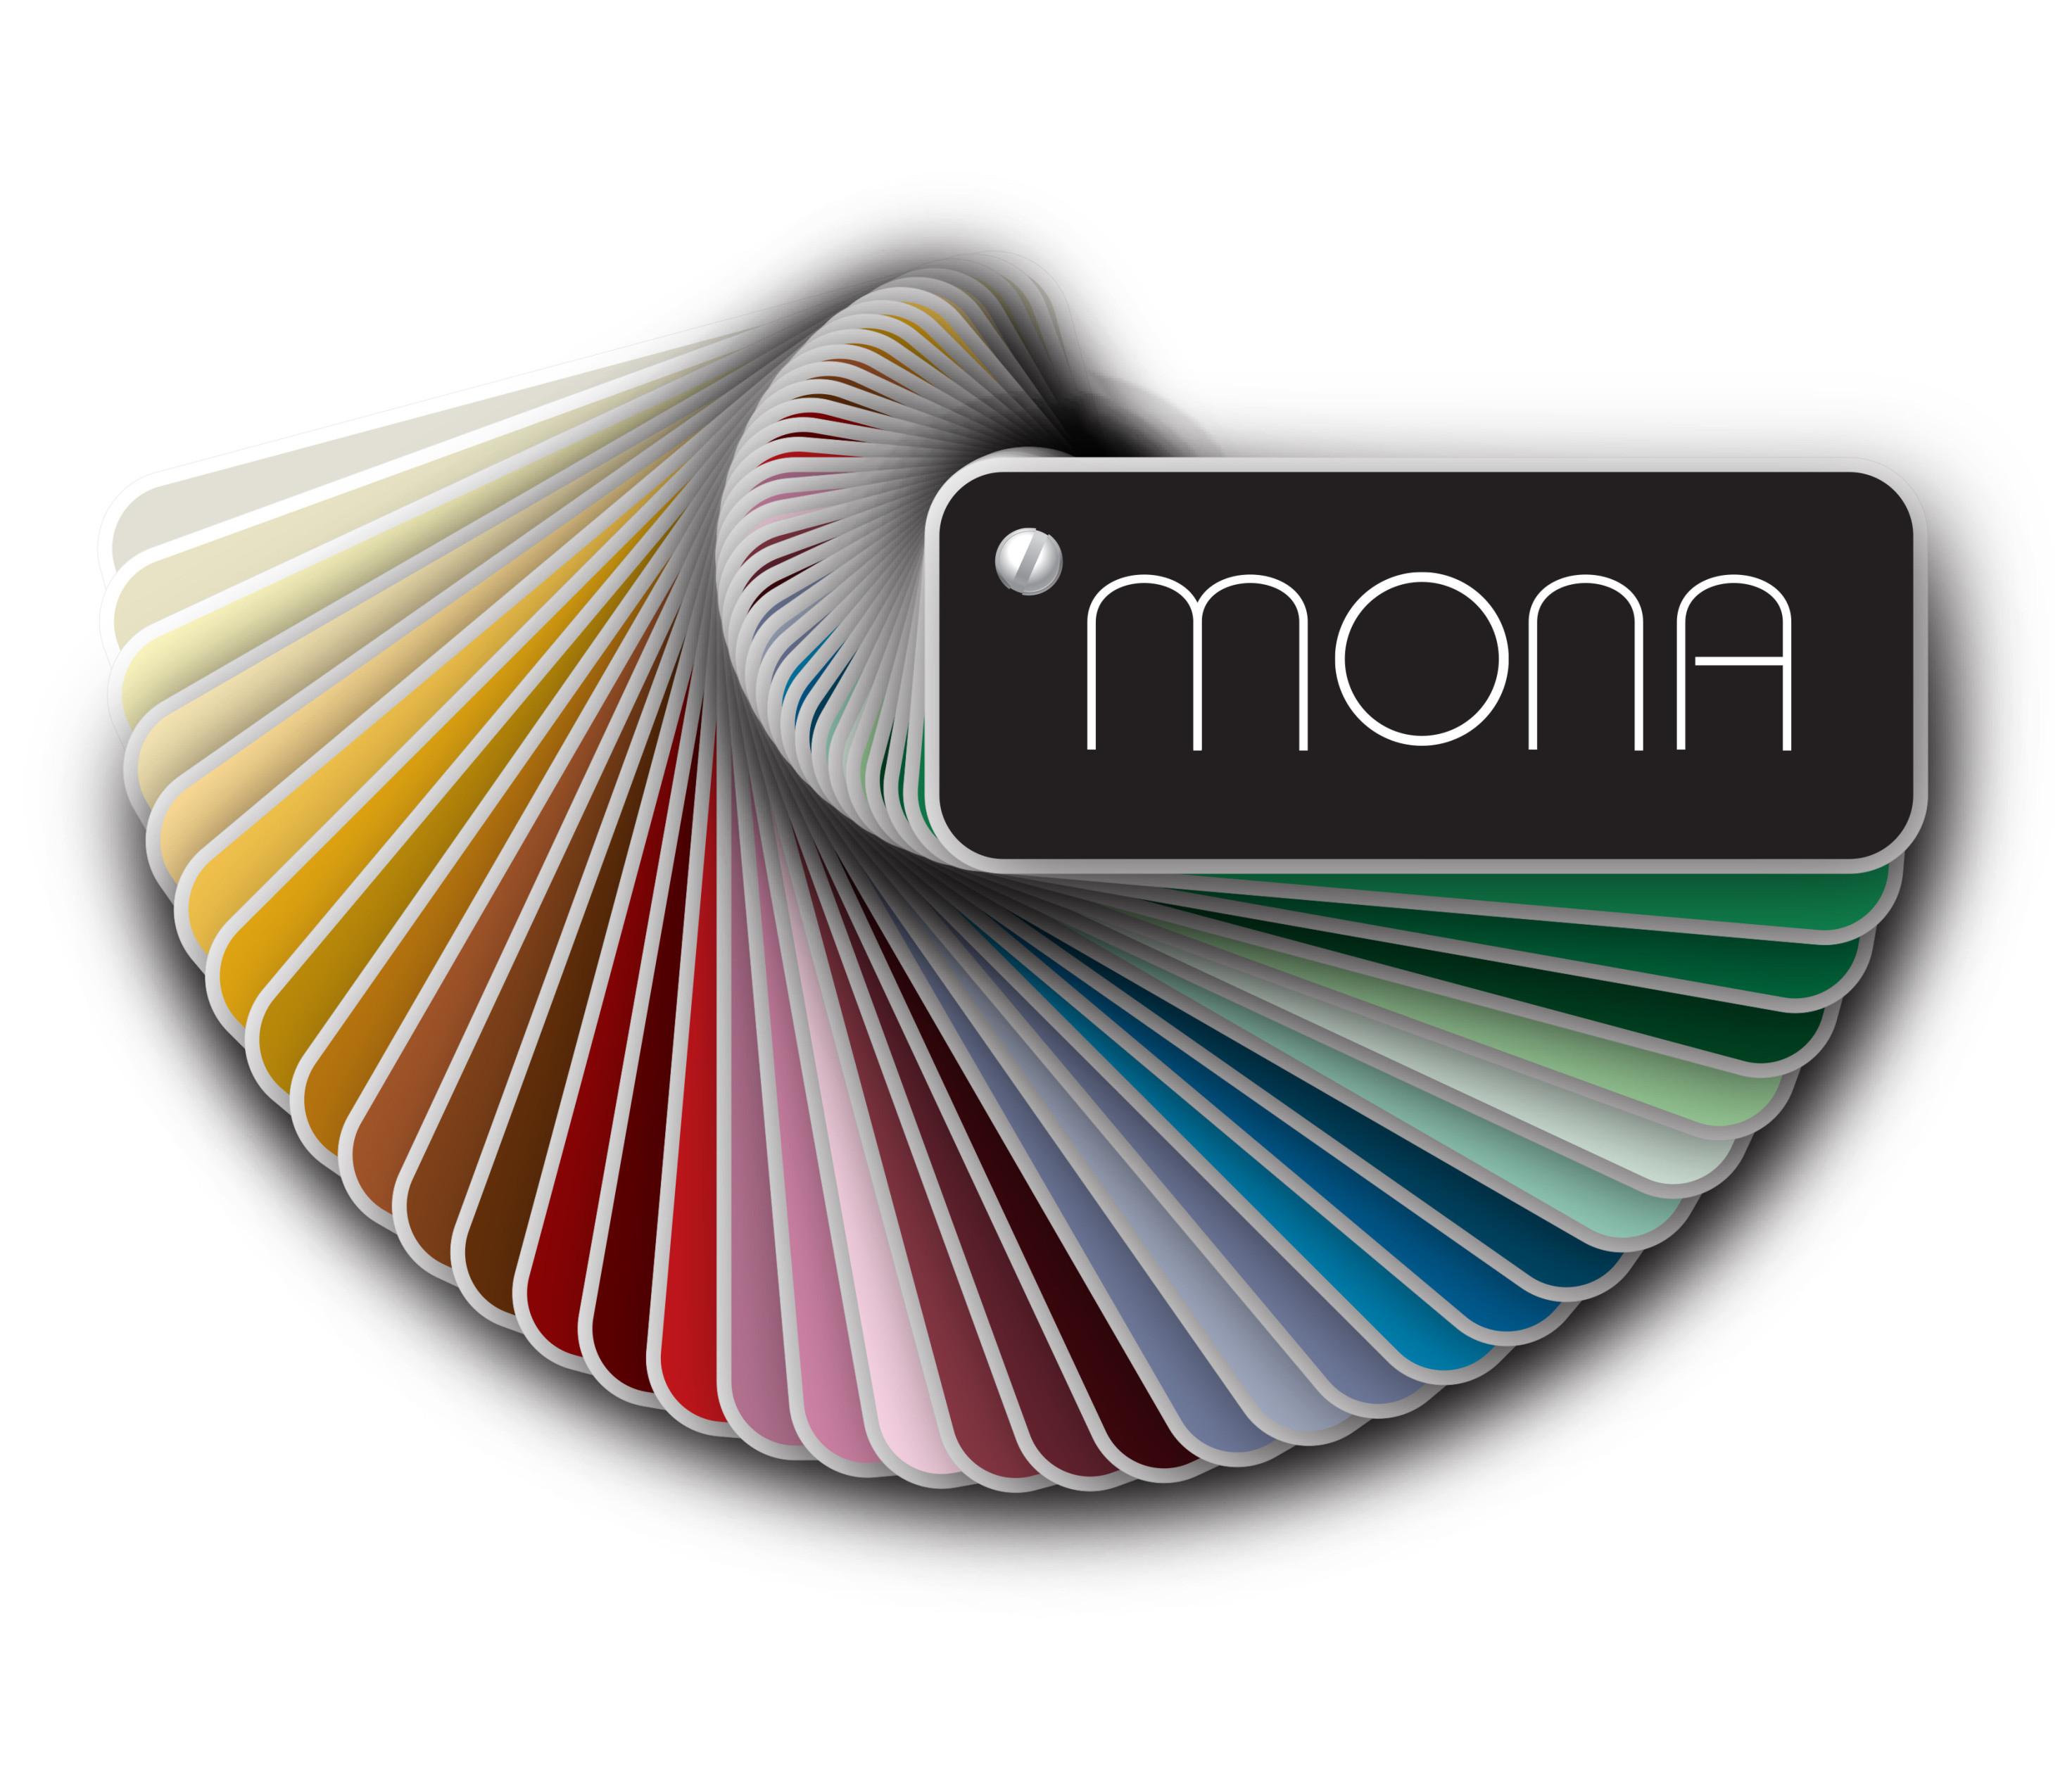 Mona logo 2015.jpg